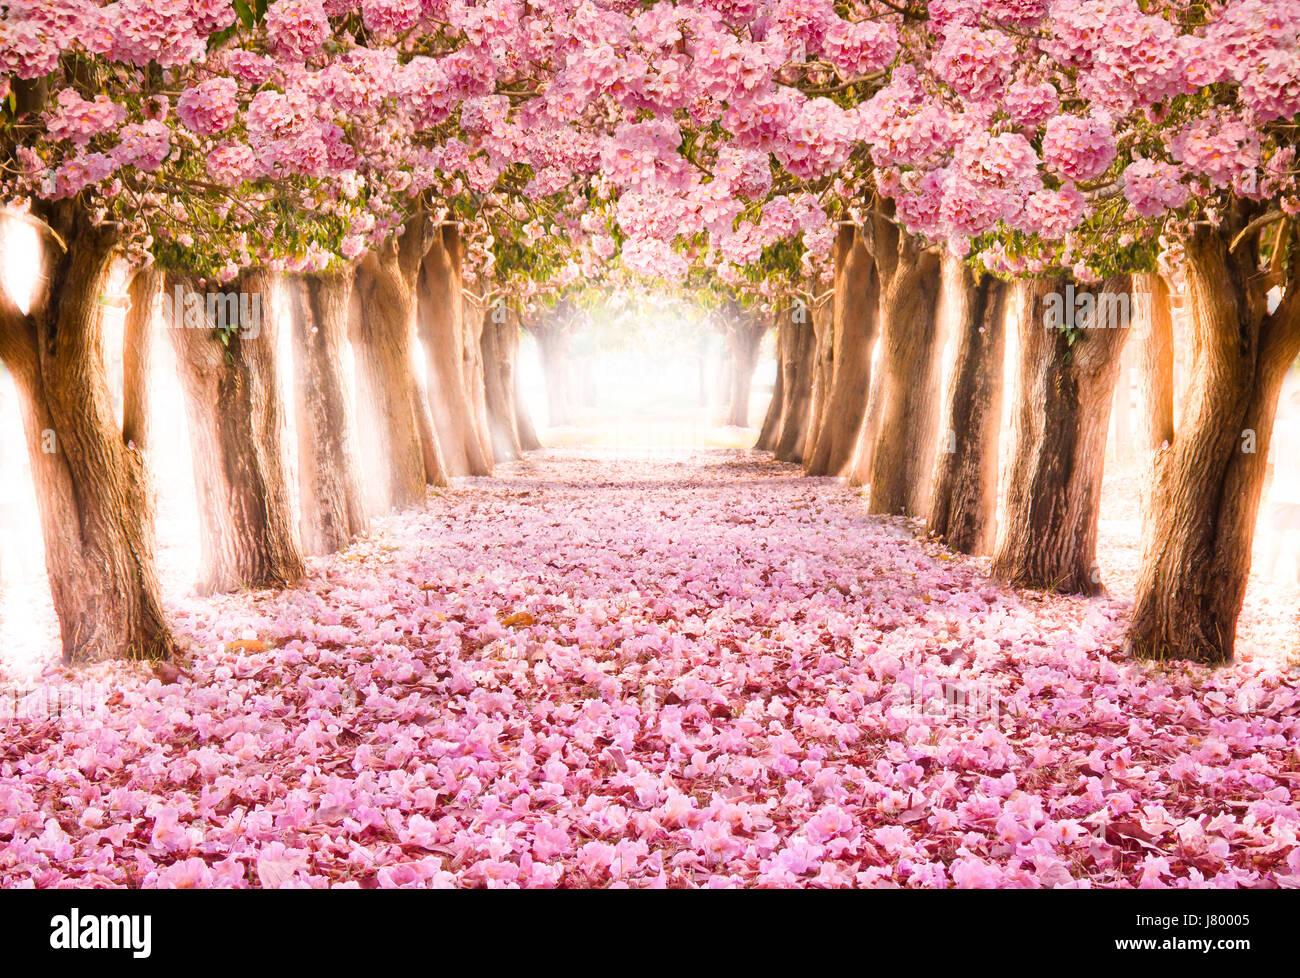 Sakura Falling Live Wallpaper Downloads Falling Petal Over The Romantic Tunnel Of Pink Flower